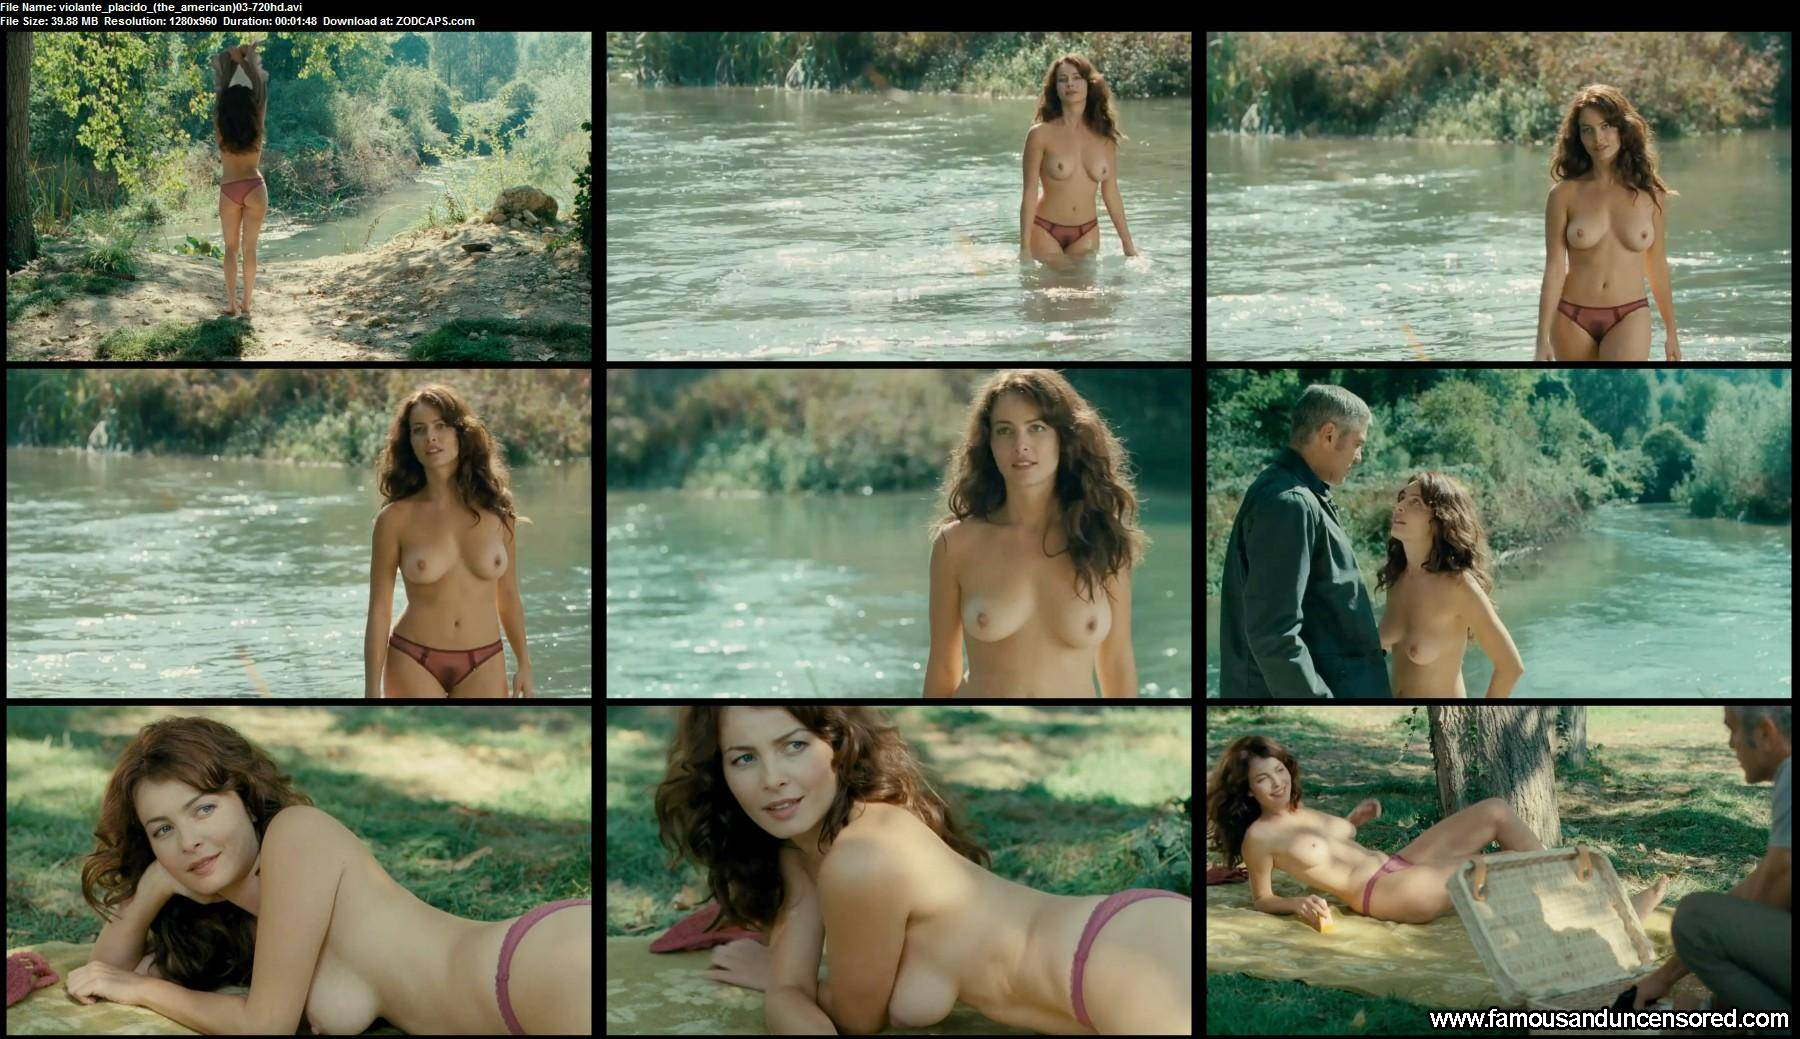 Alba ribas nude sex scene in diario de una ninfomana movie 7